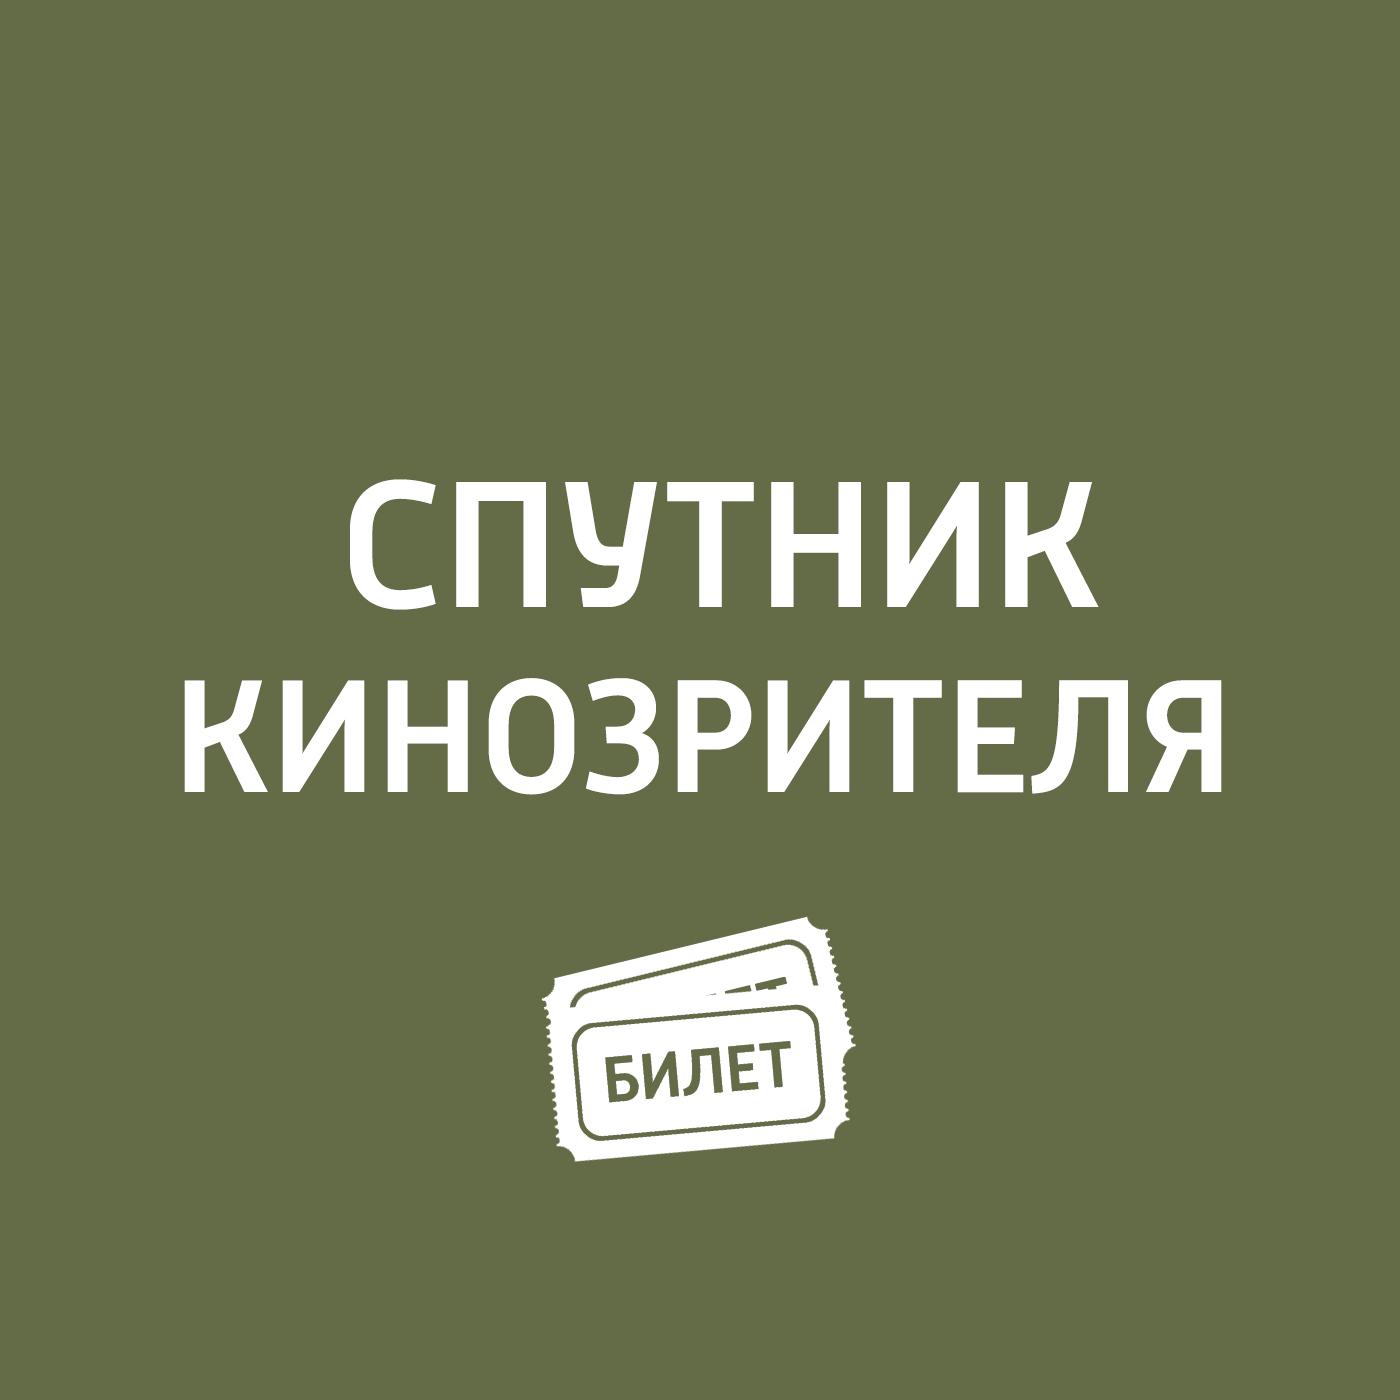 Антон Долин VA-банк, «Пленница, «Околофутбола va va voom [clean]